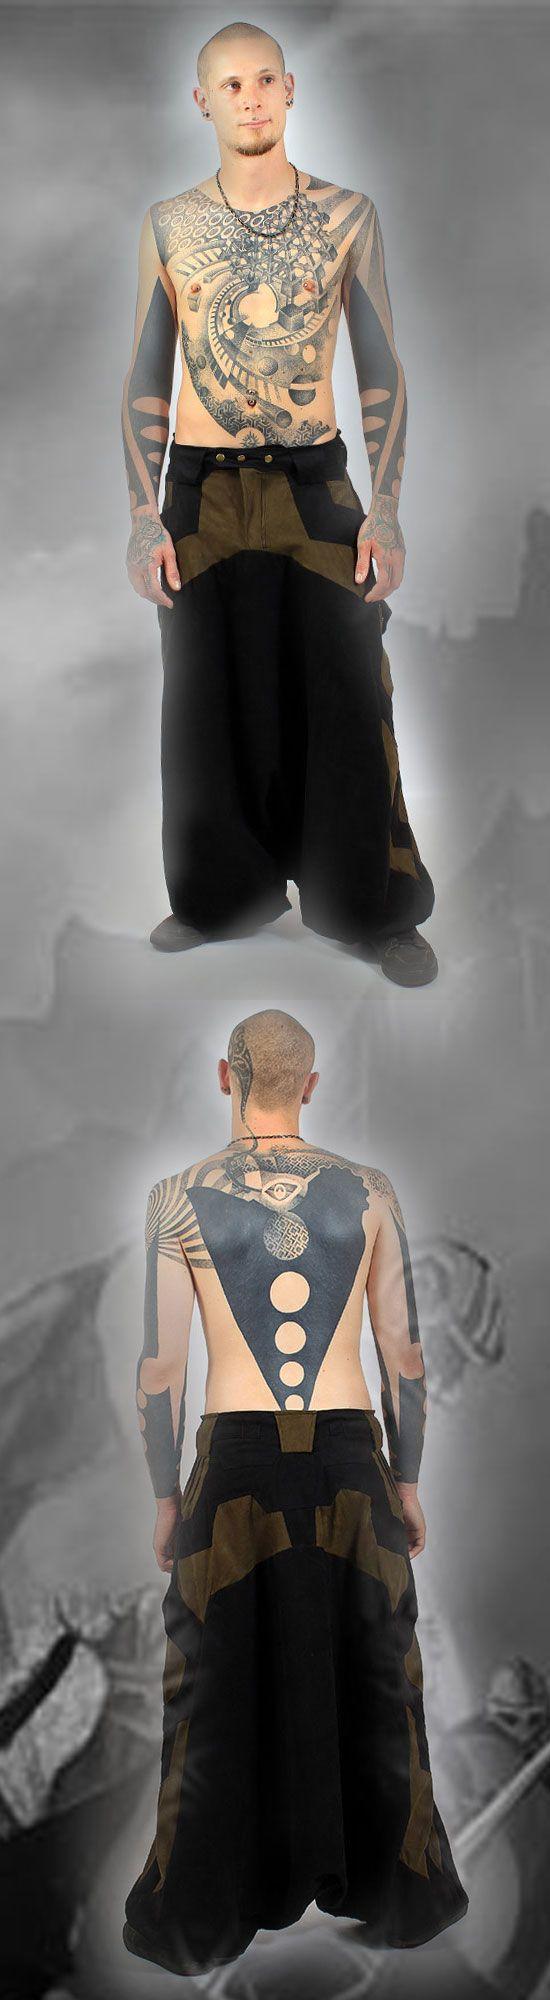 Sarouel felpe cyber futuristic bohemian Dystopian Wasteland Fashion clothing